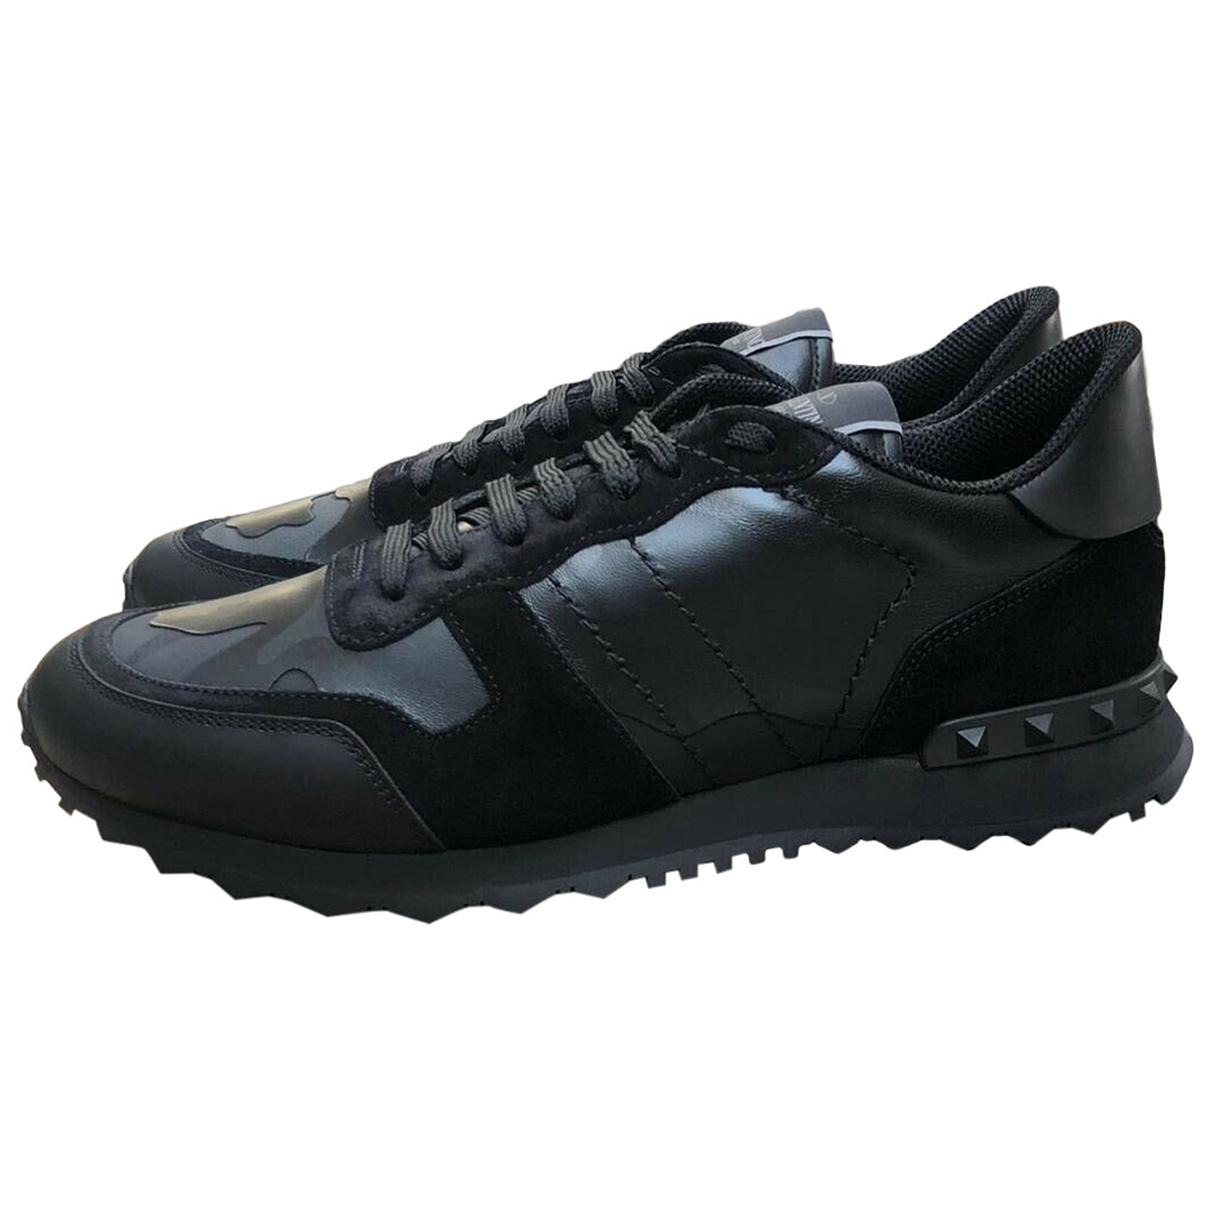 Valentino Garavani Rockrunner Black Leather Trainers for Men 40 EU